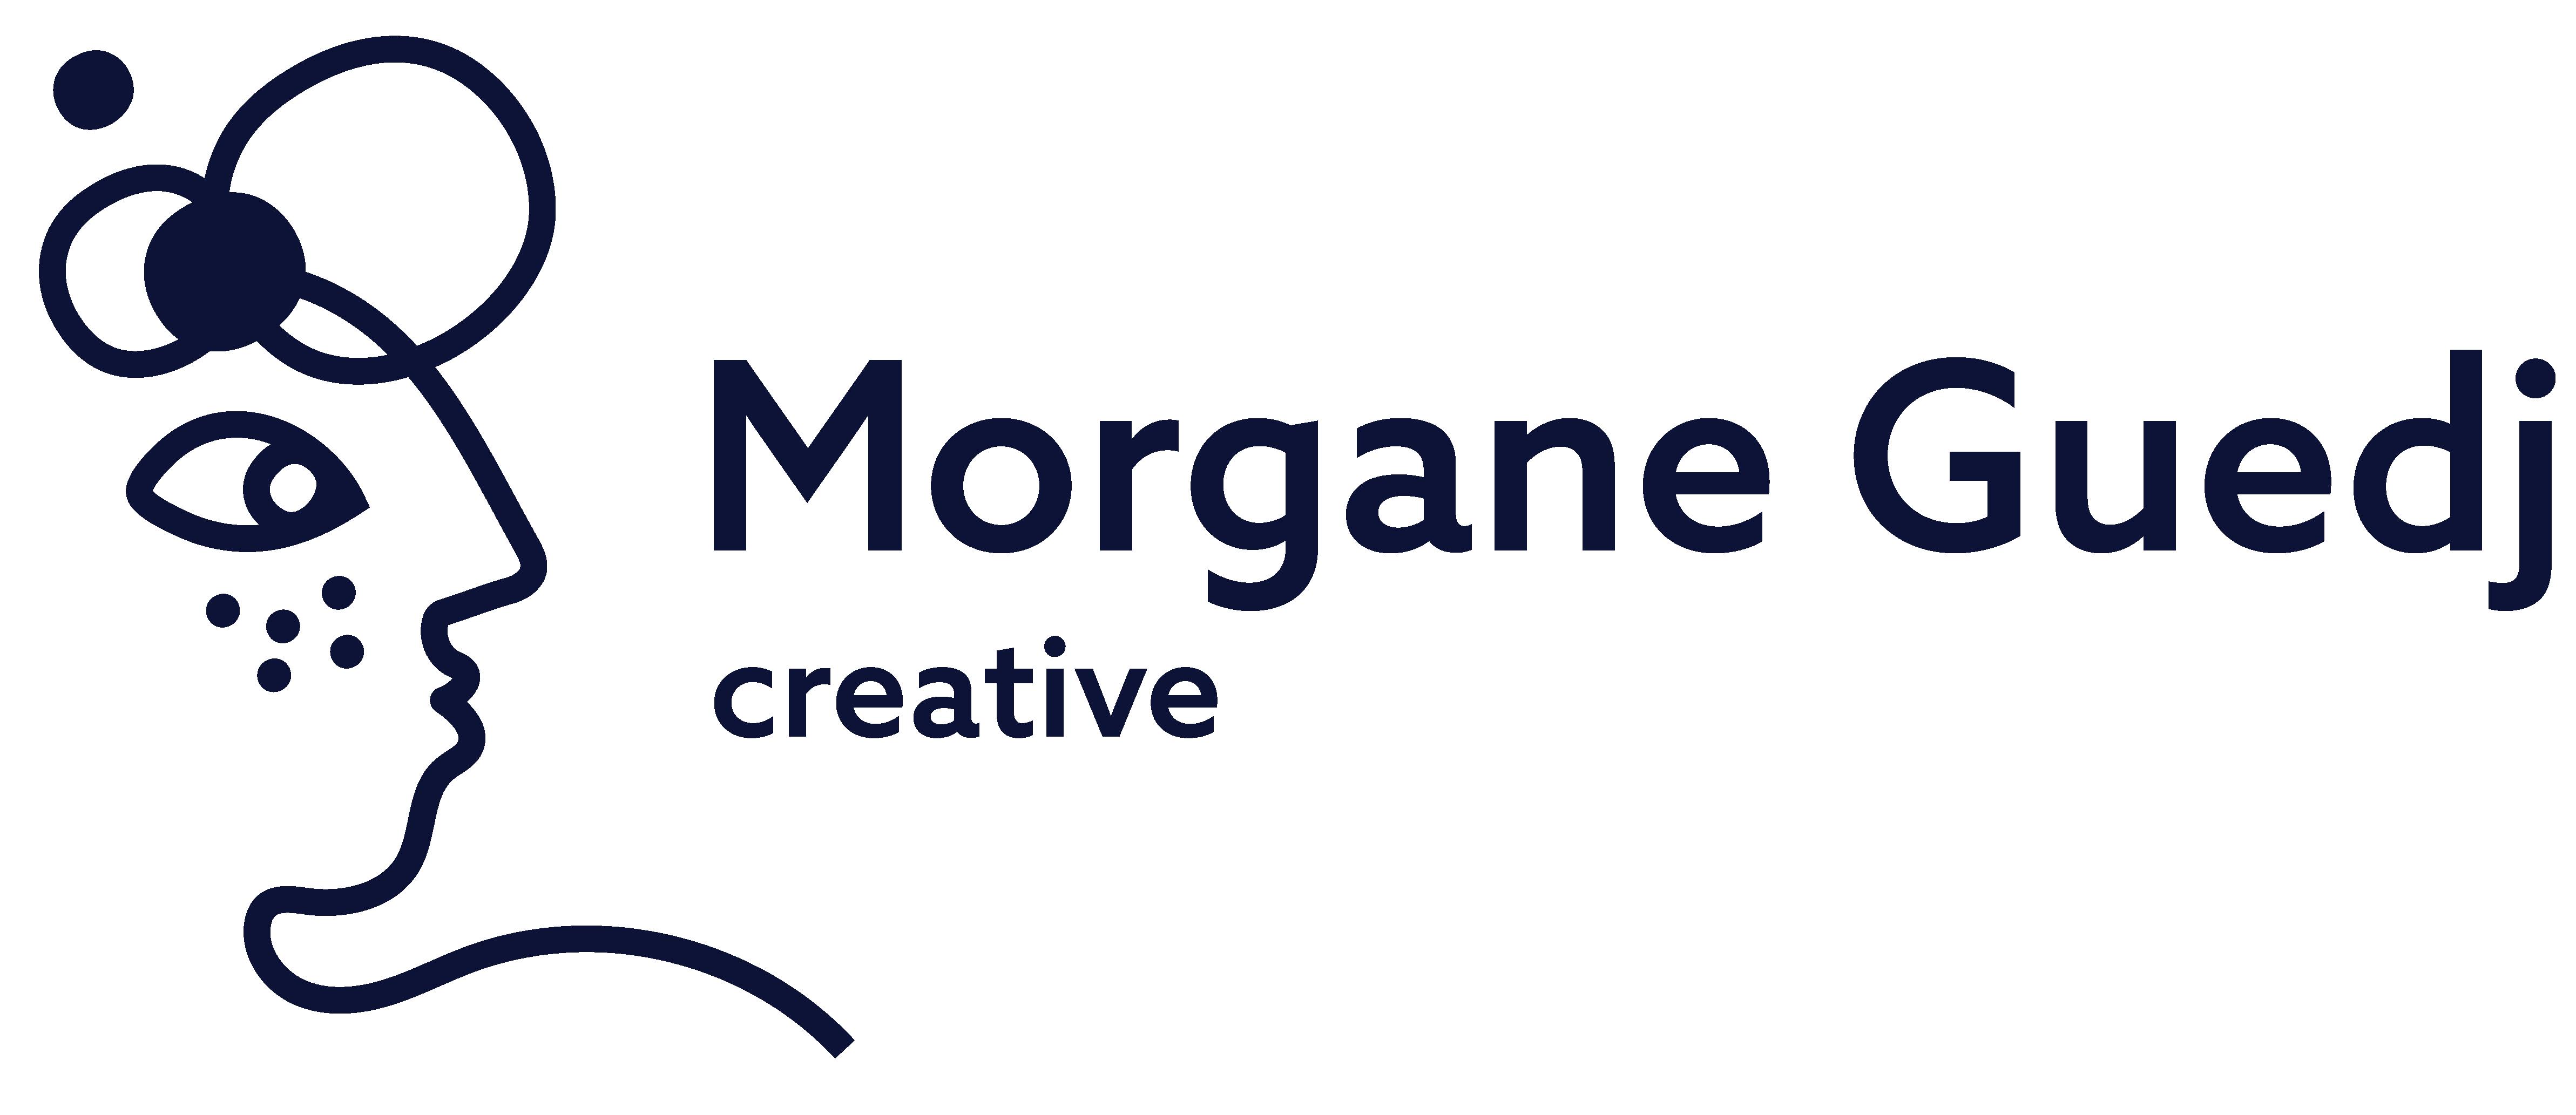 Morgane Guedj Creative   Graphic Design & Illustration